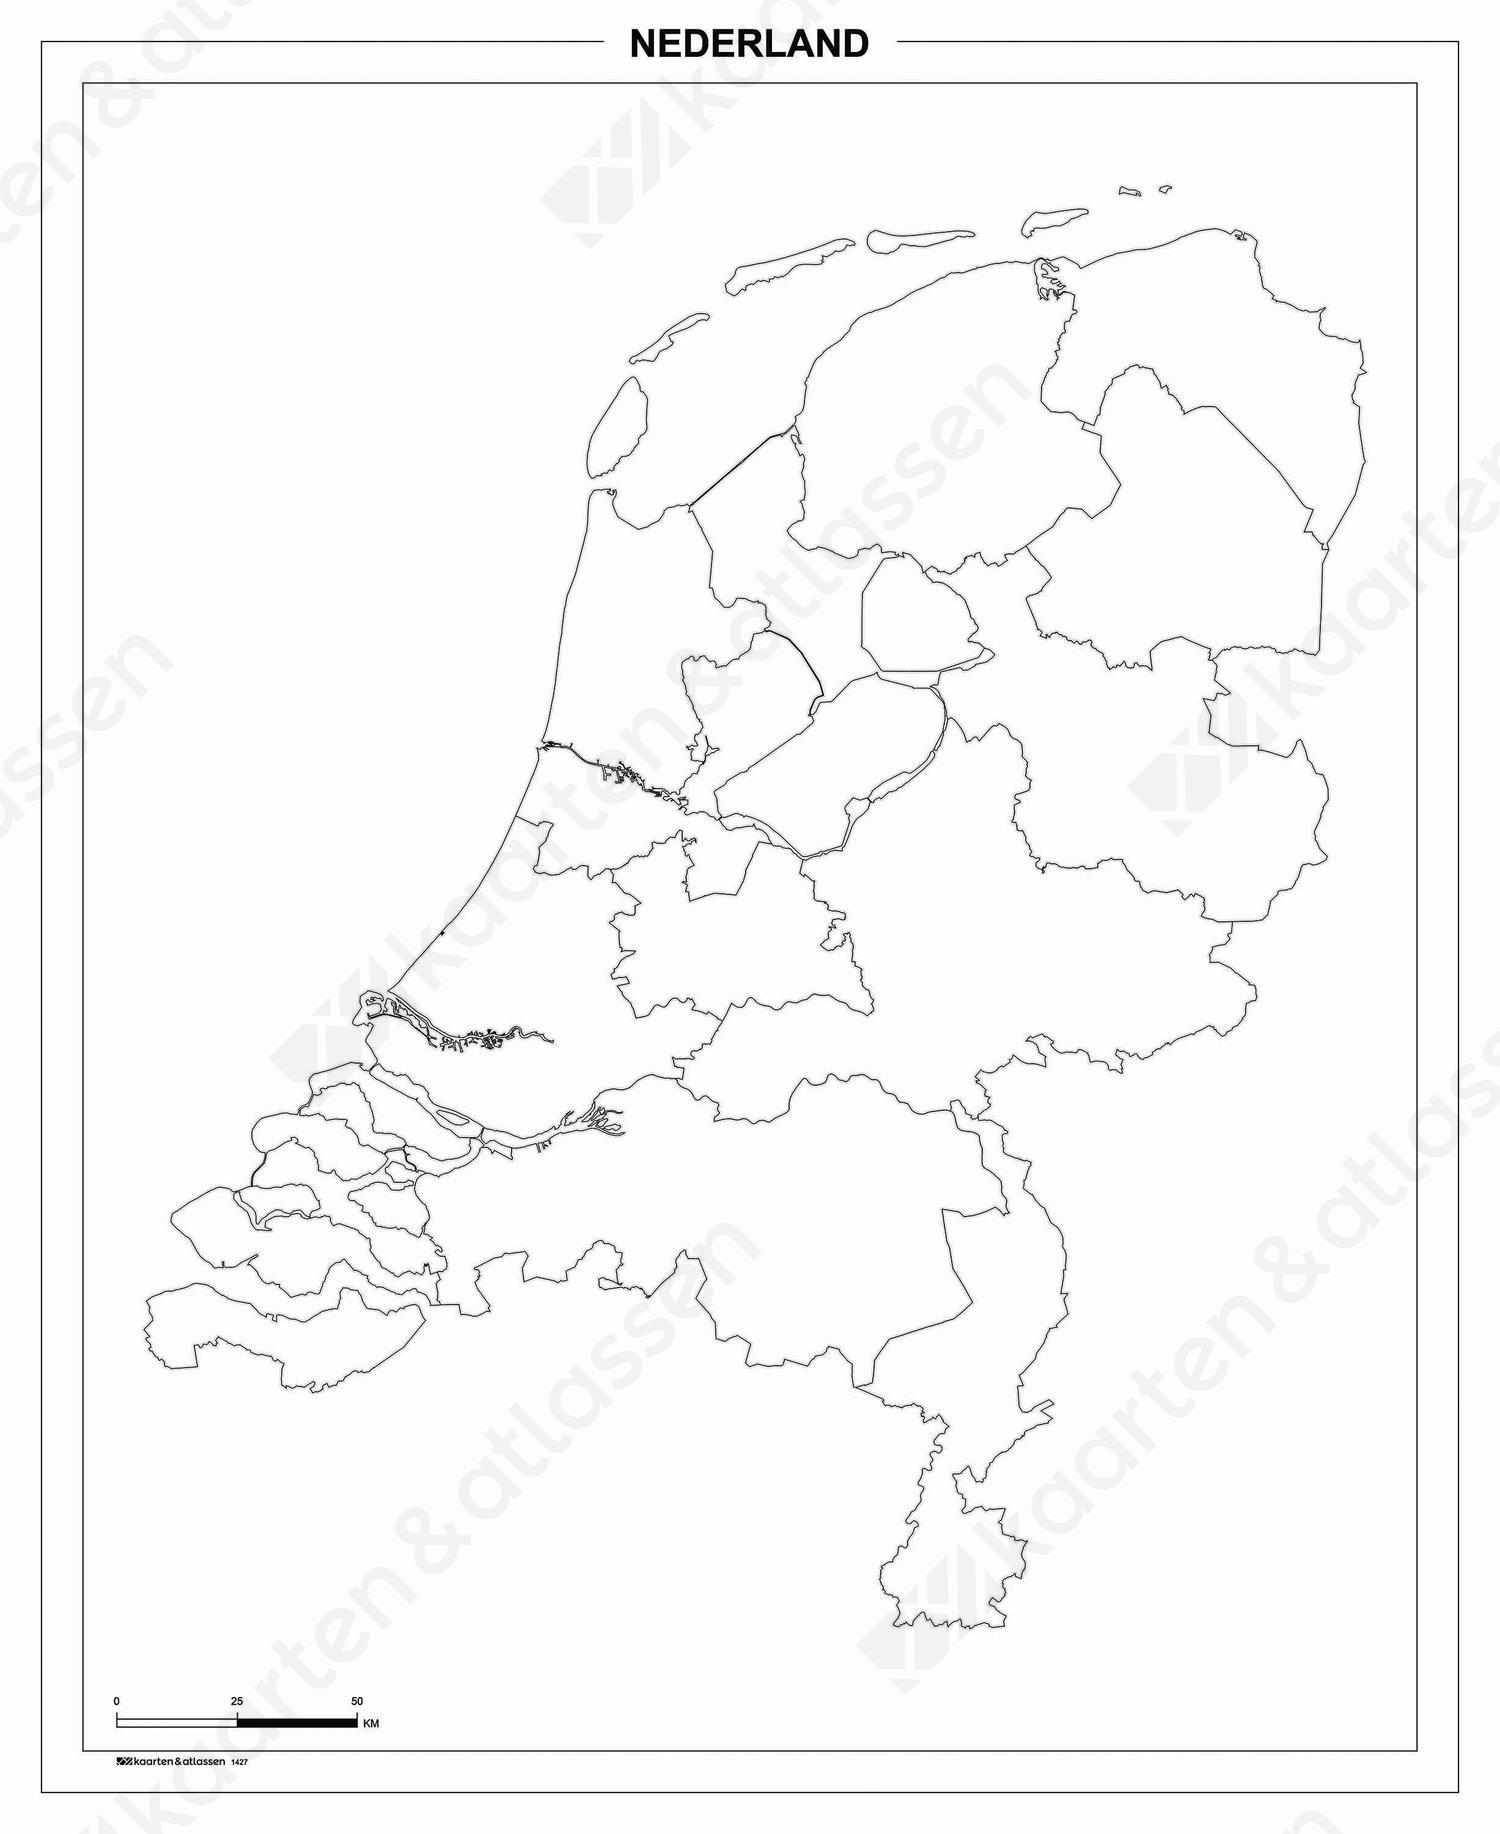 Blinde schoolkaart Nederland